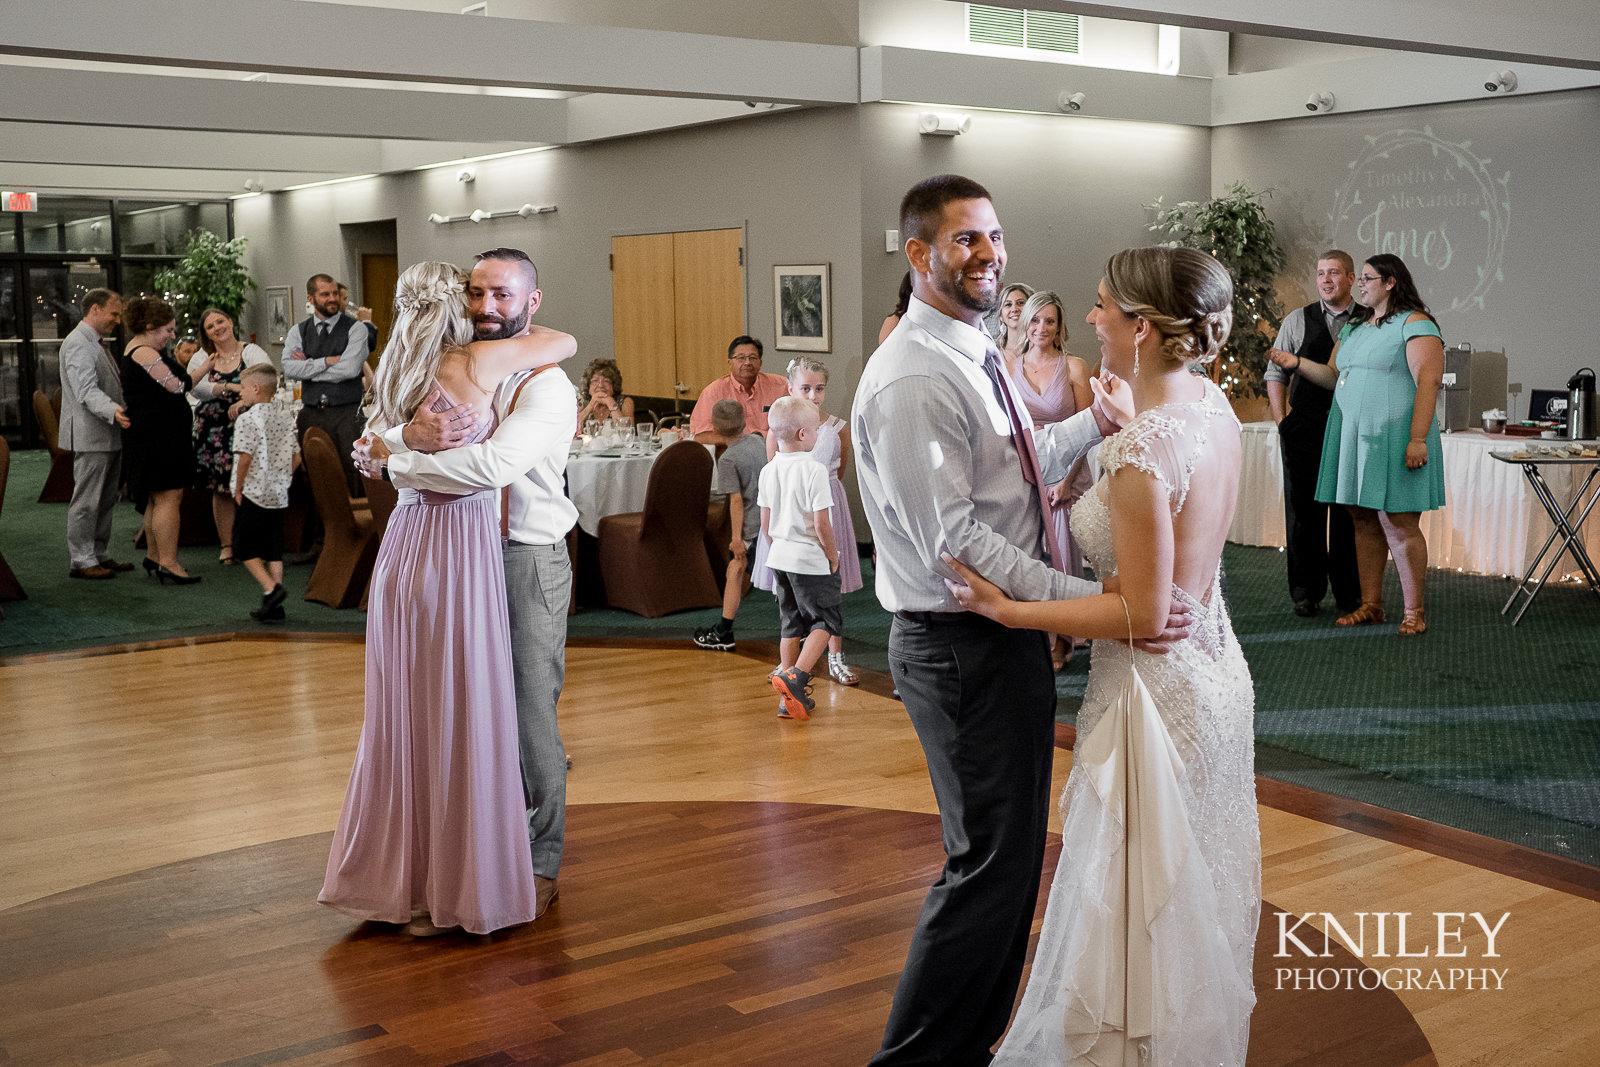 107 - Ontario Golf Club Wedding Pictures - XT2A7389.jpg